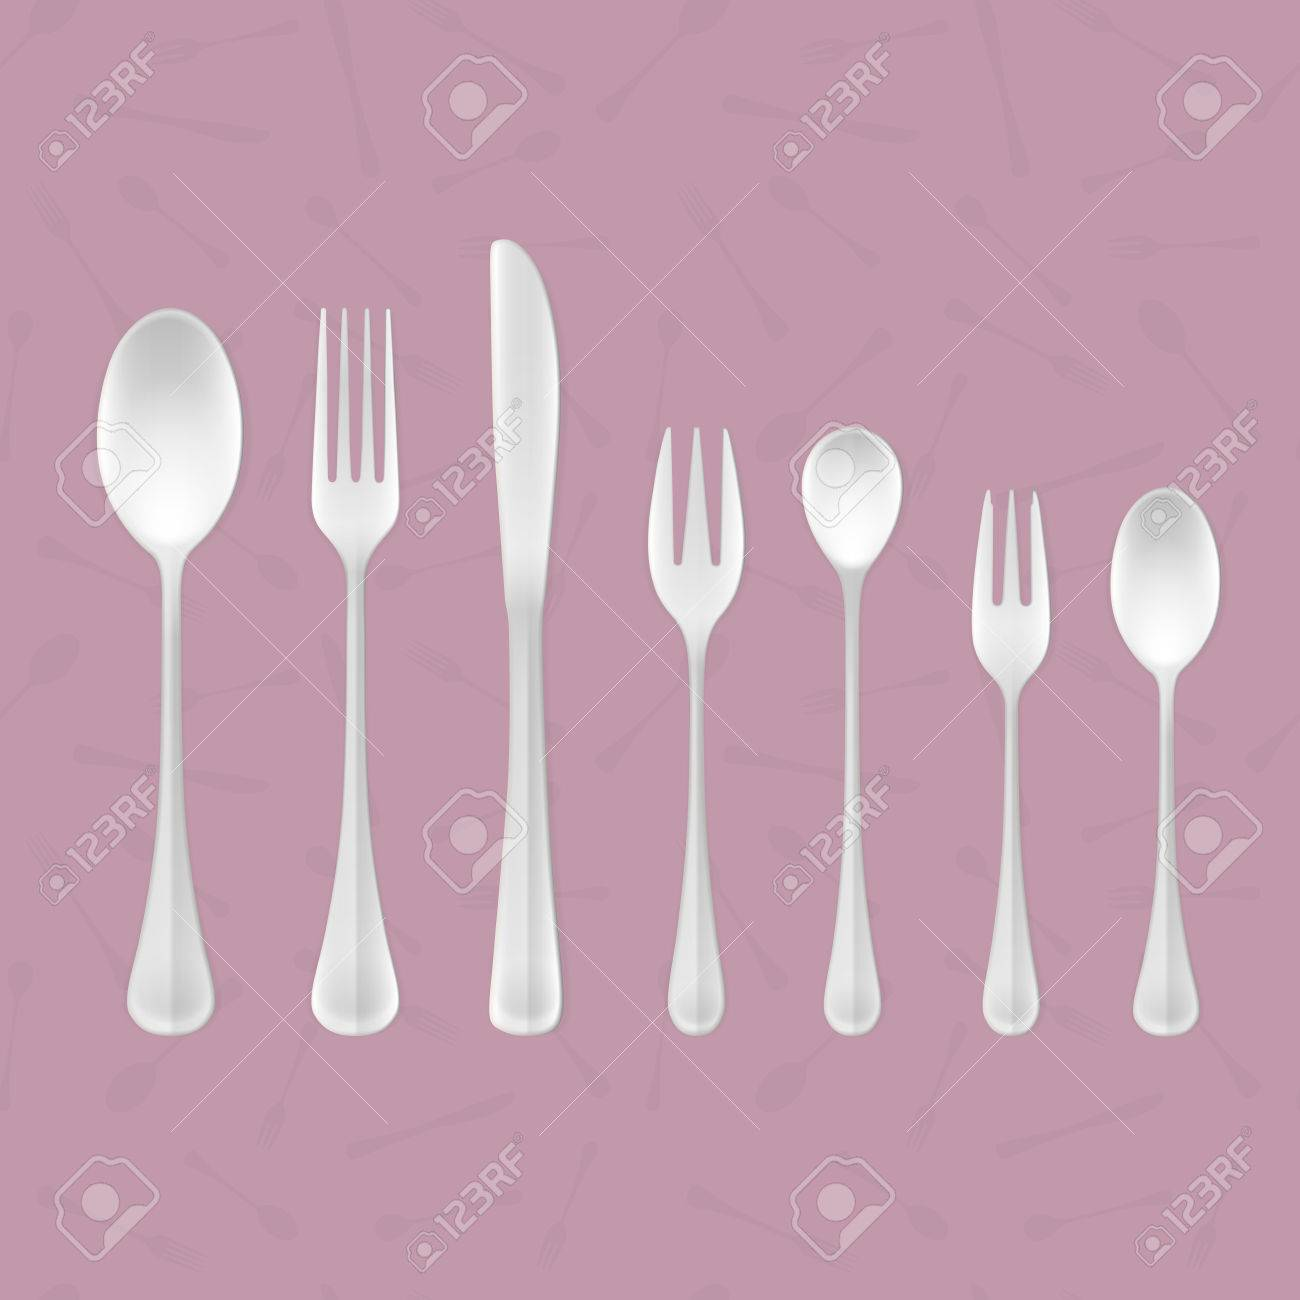 Dimensioni Standard Tavolo Cucina : Misure standard tavoli cucina ...